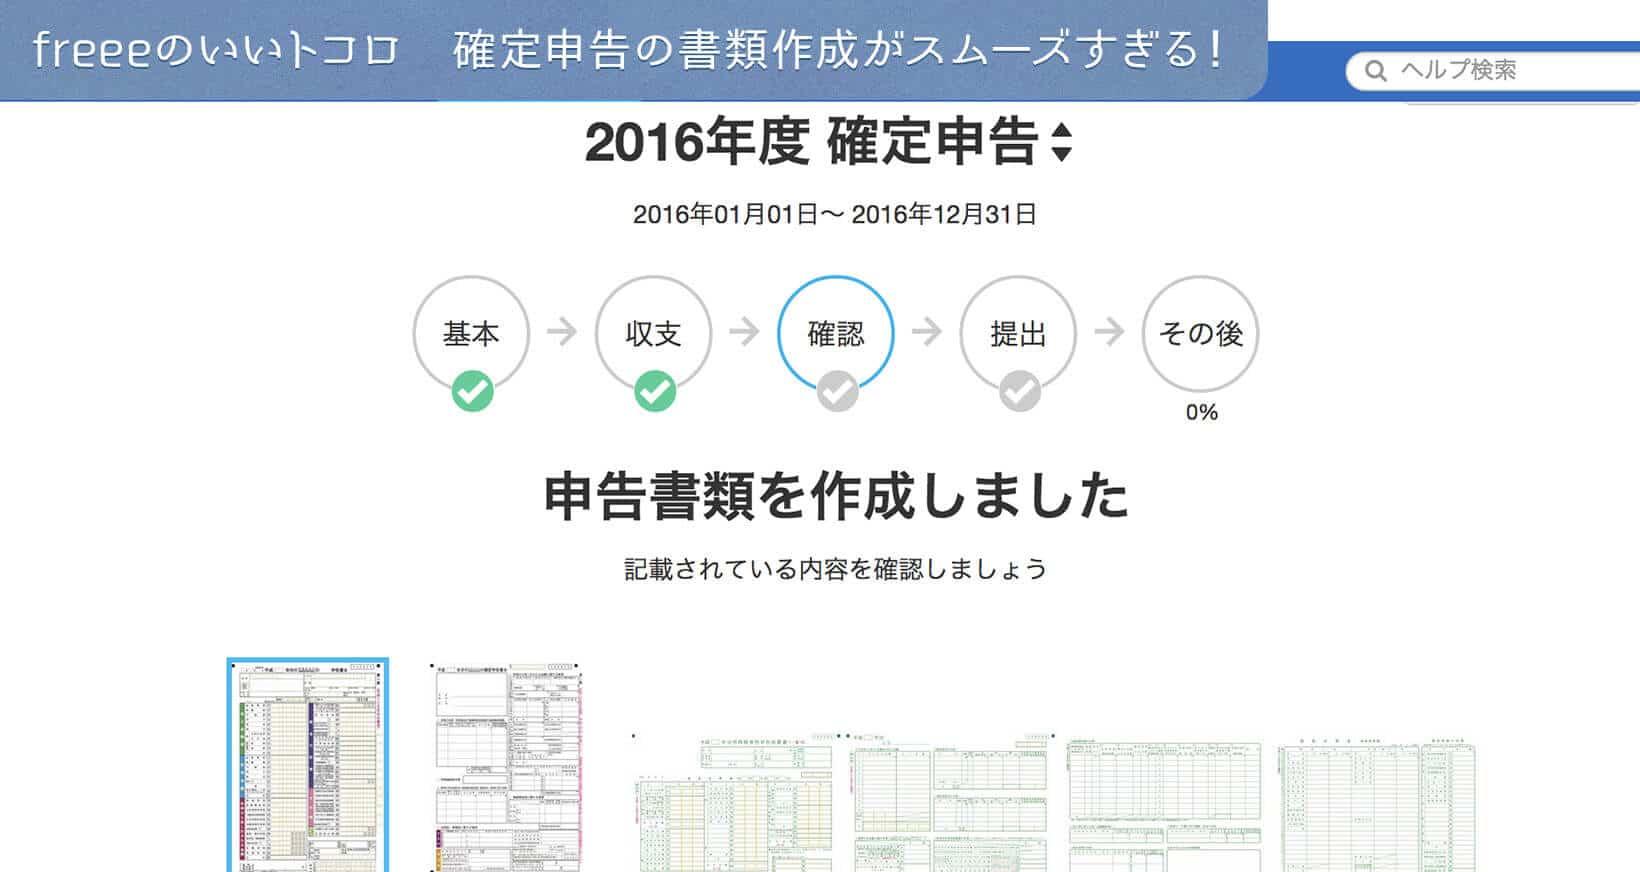 freee 確定申告 オンライン会計ソフト簡単 手軽